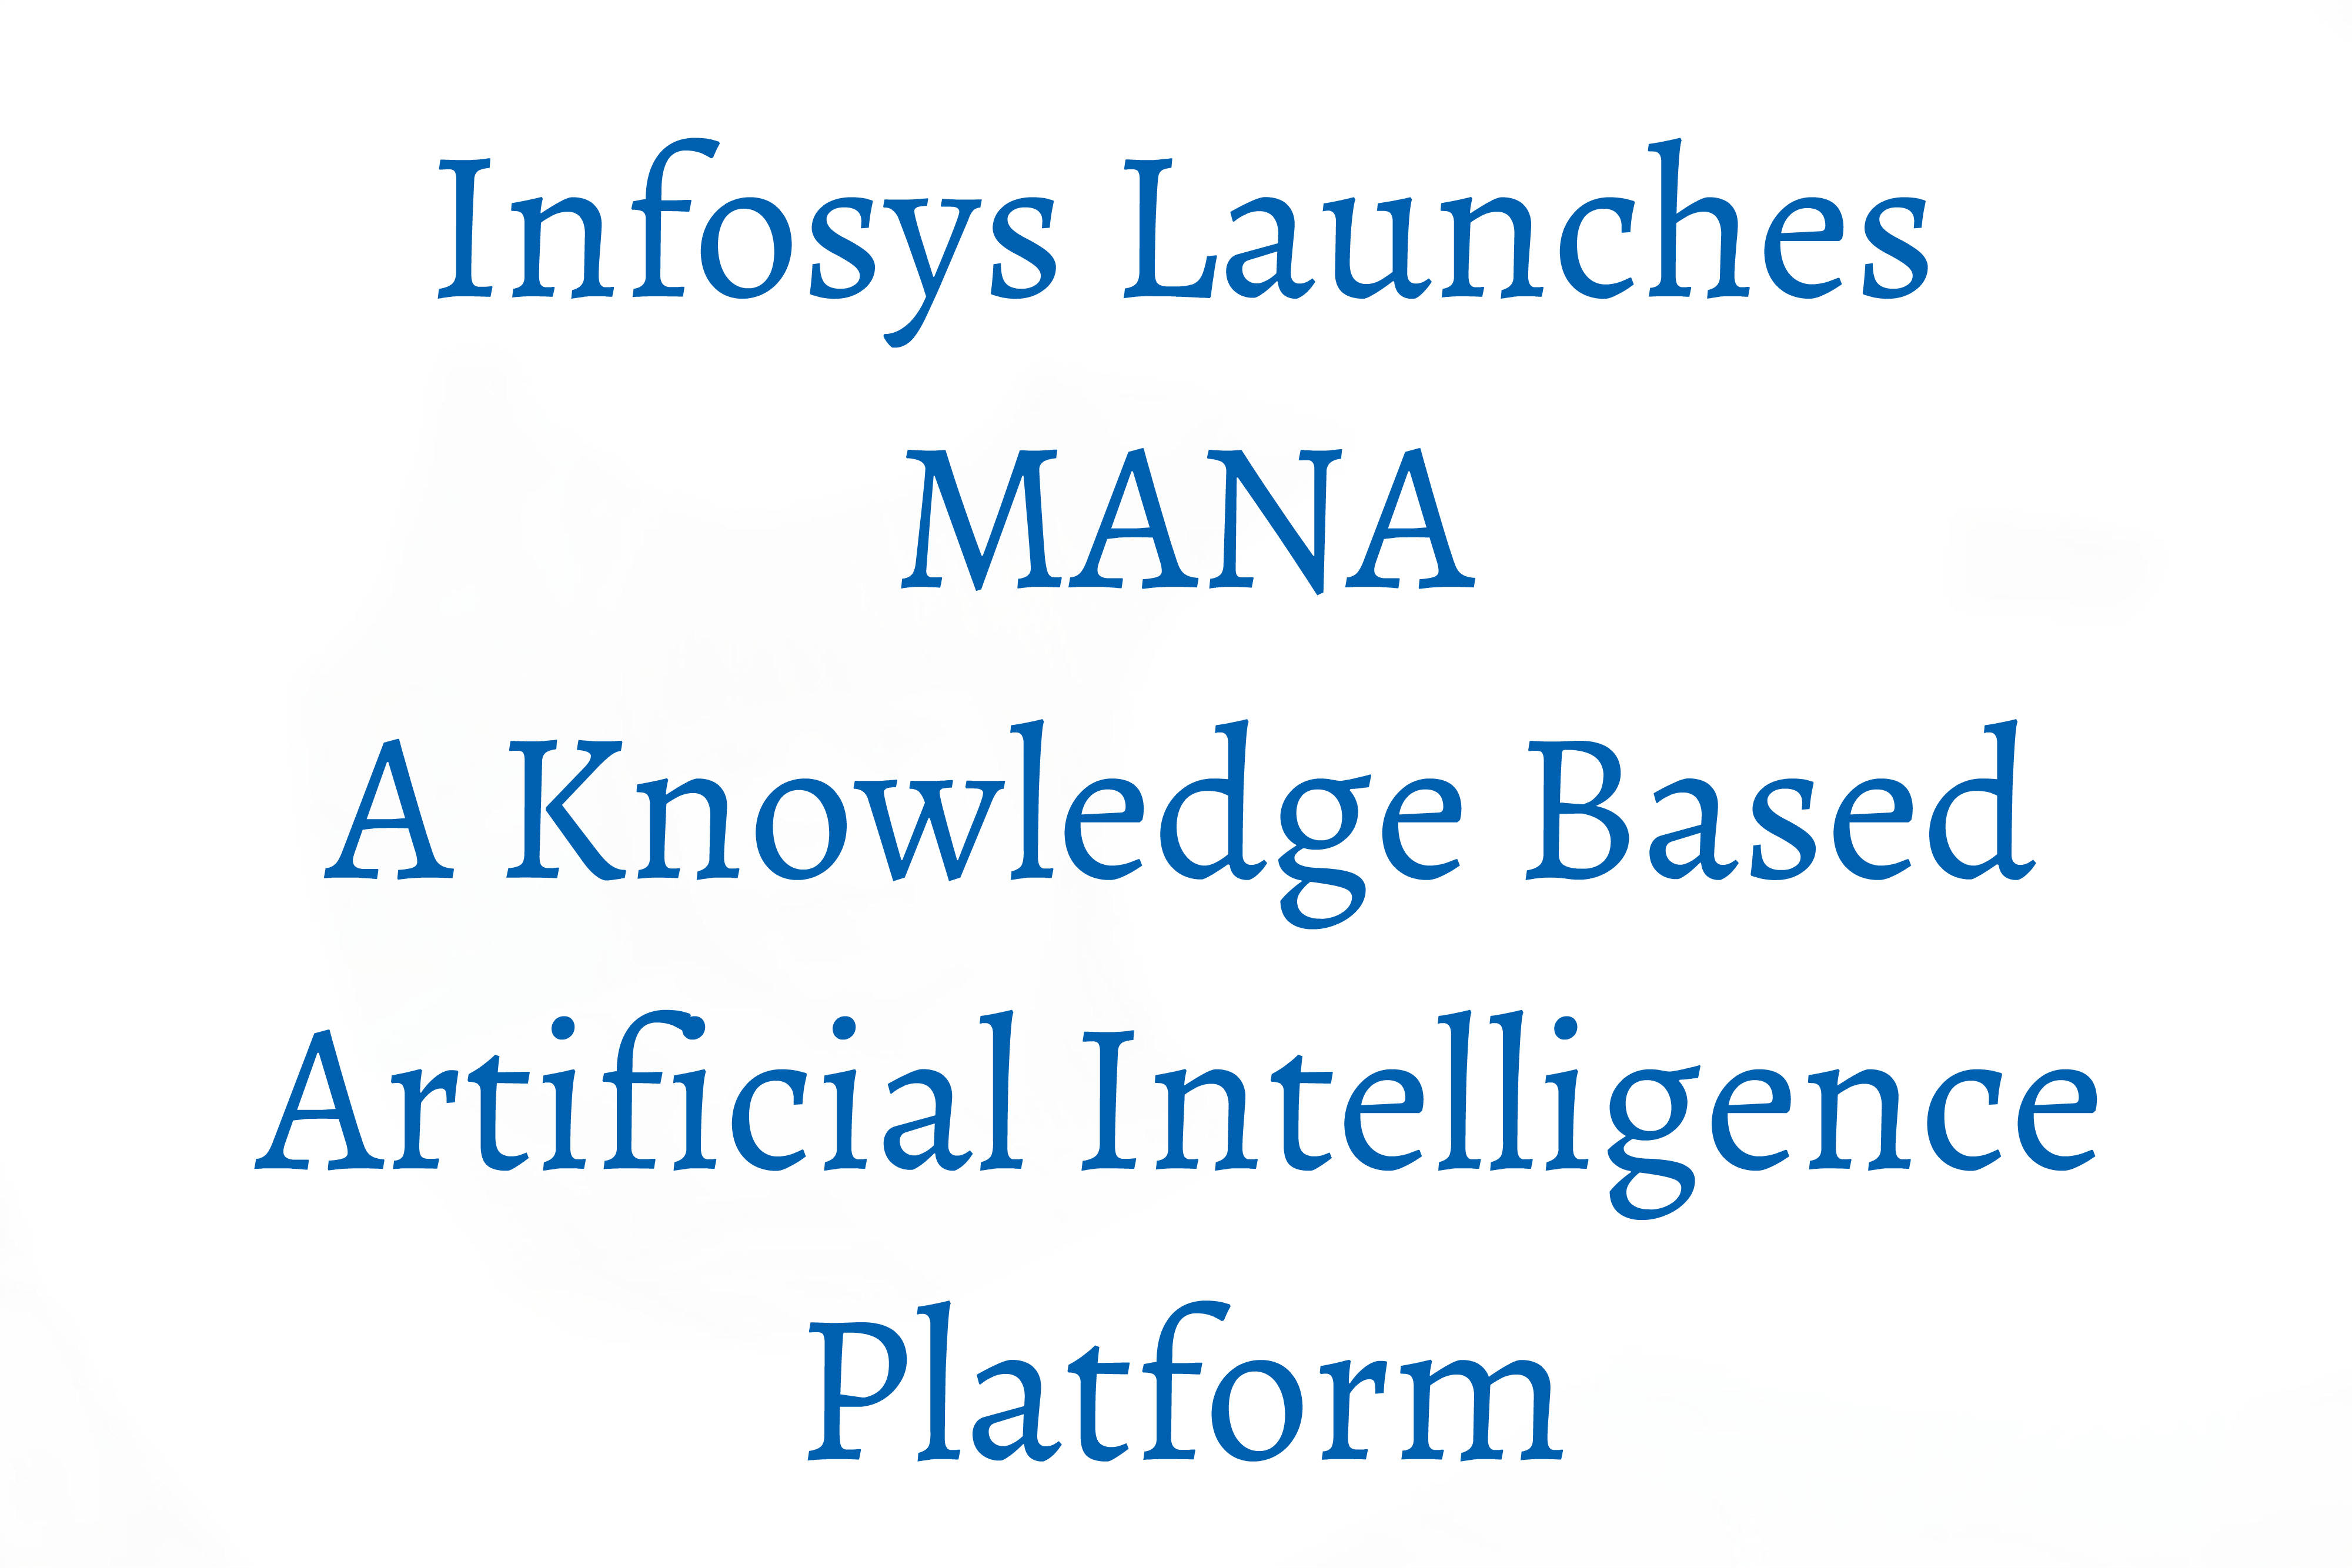 MANA Platform